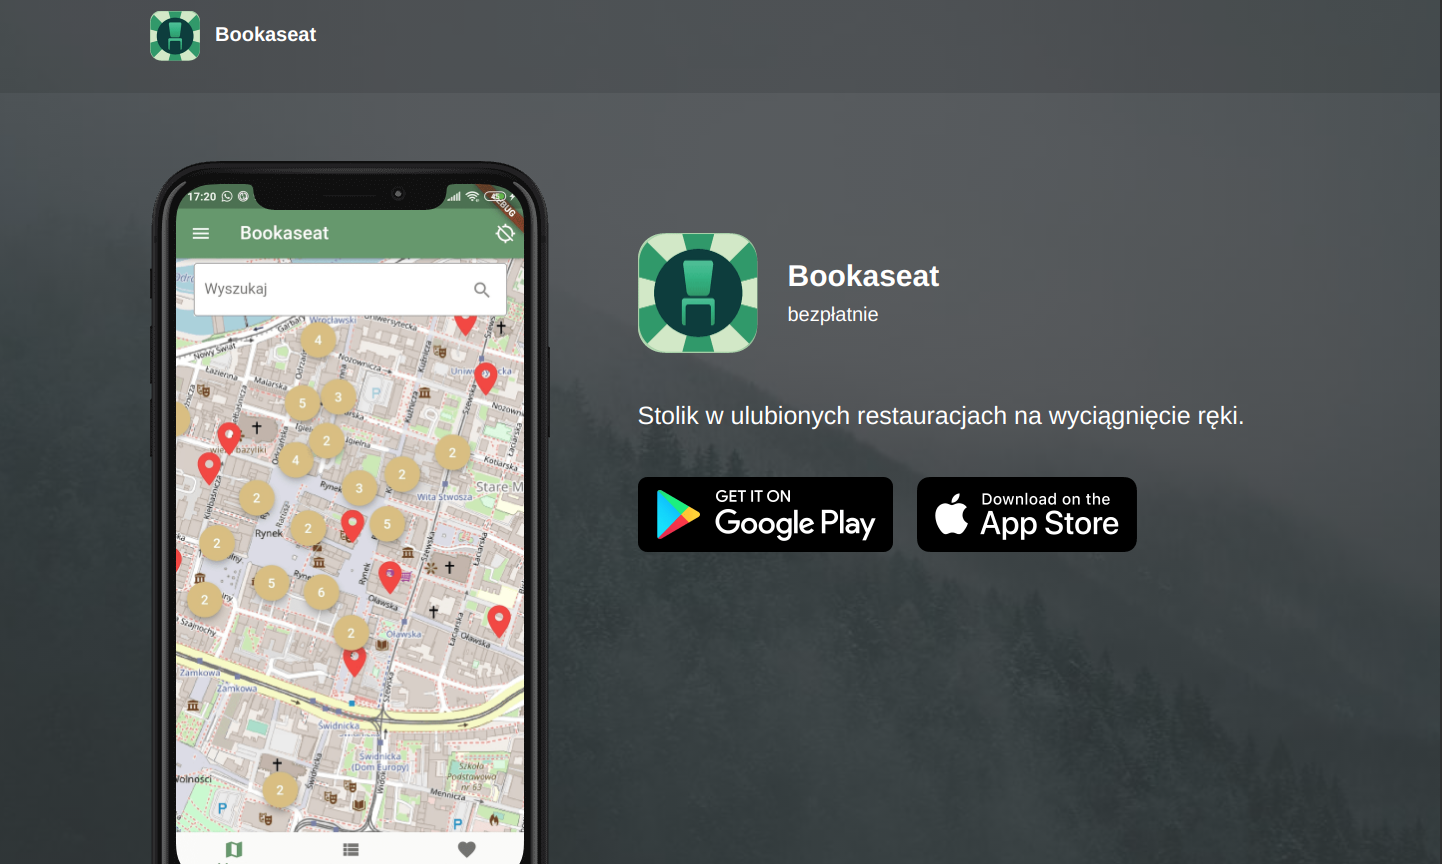 Screenshot of Bookaseat